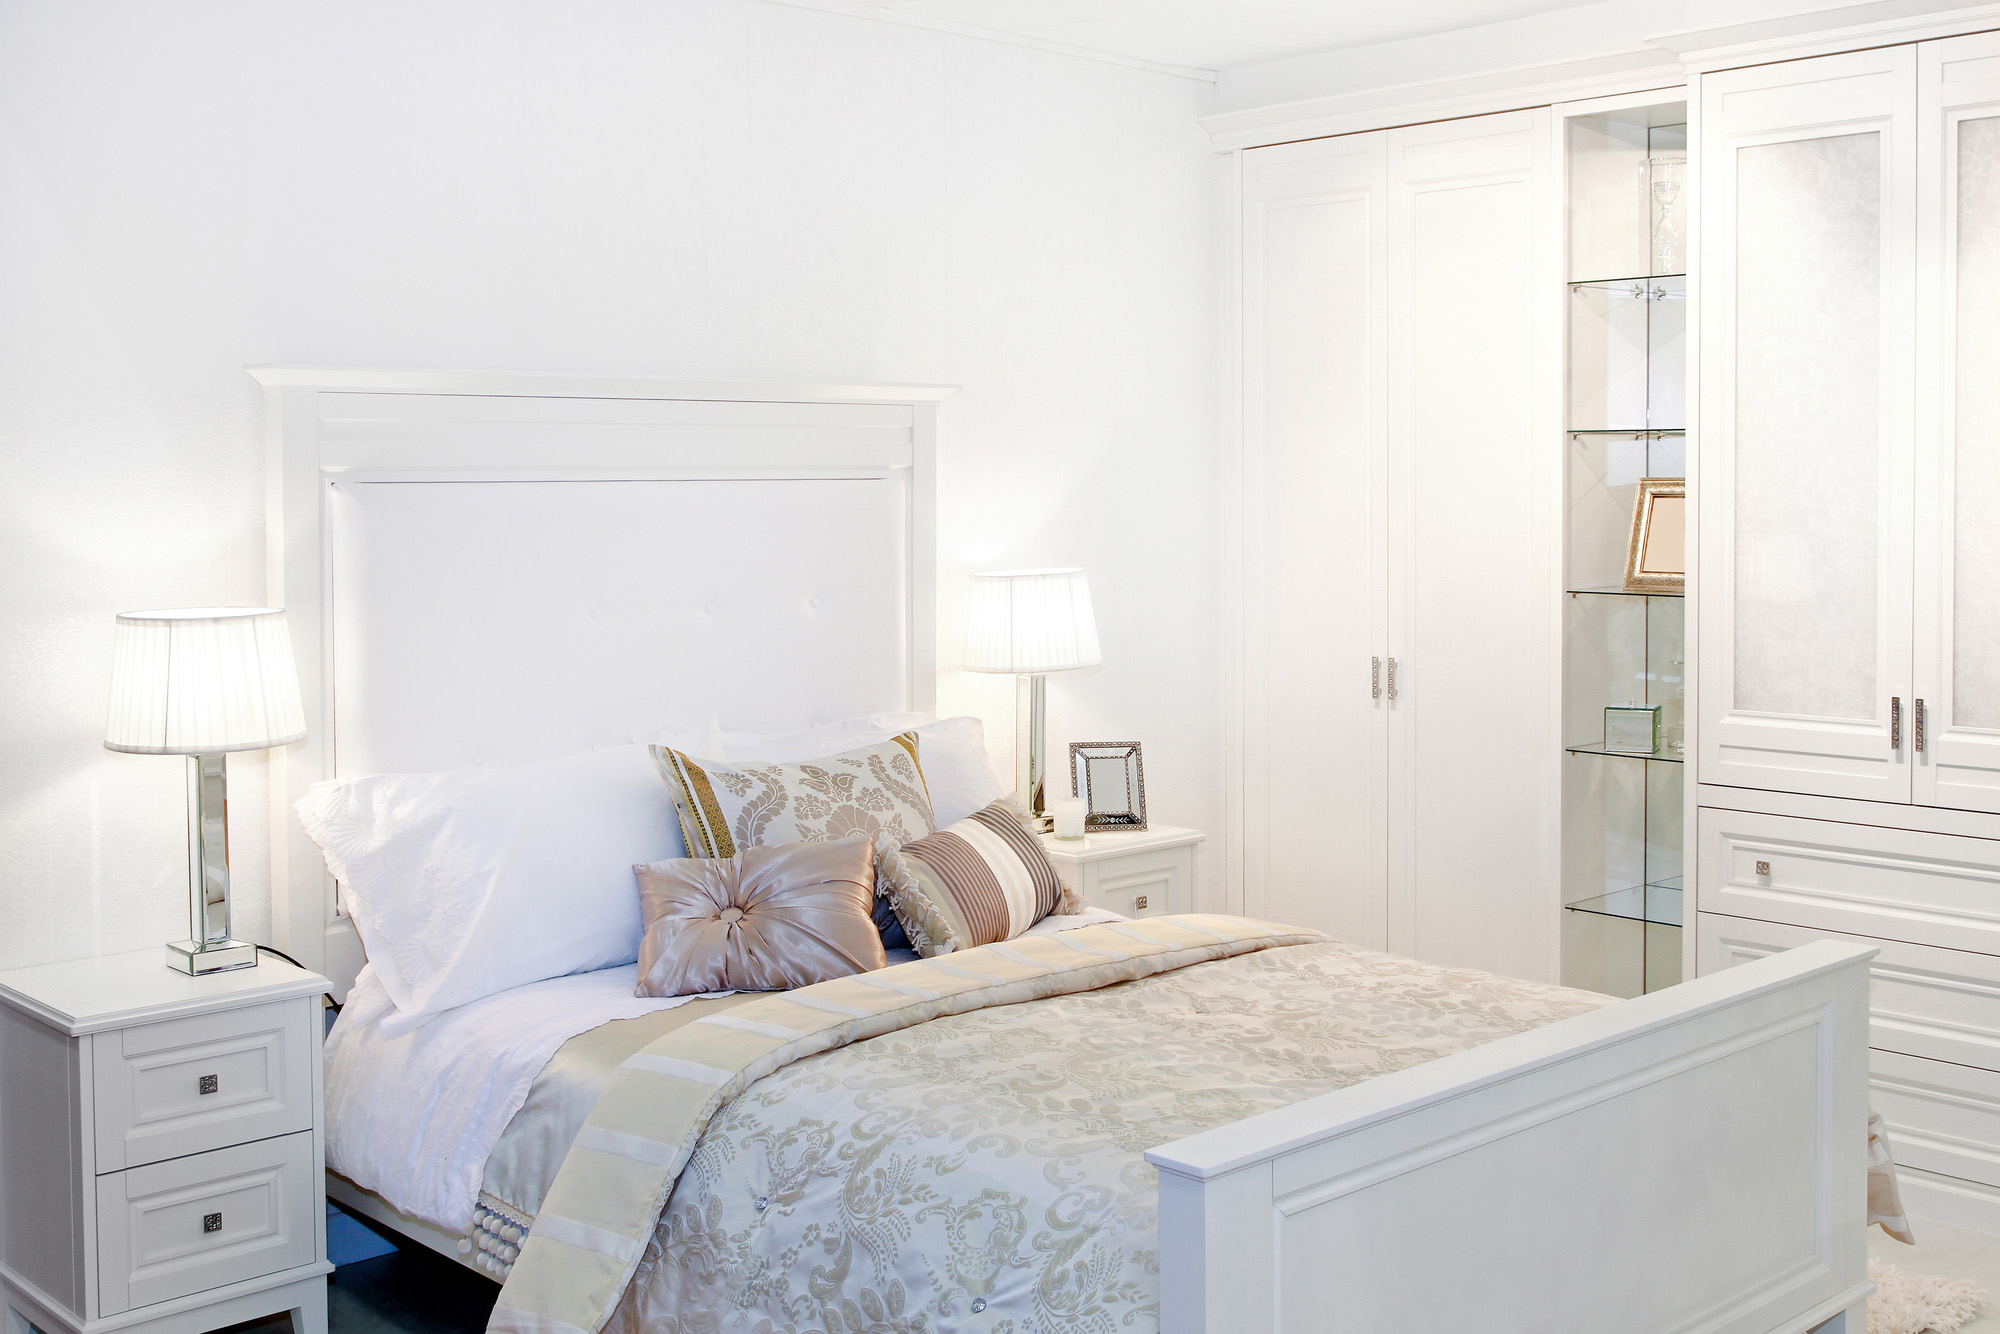 fitted wardrobes, white wardrobes, hinged wardrobe doors